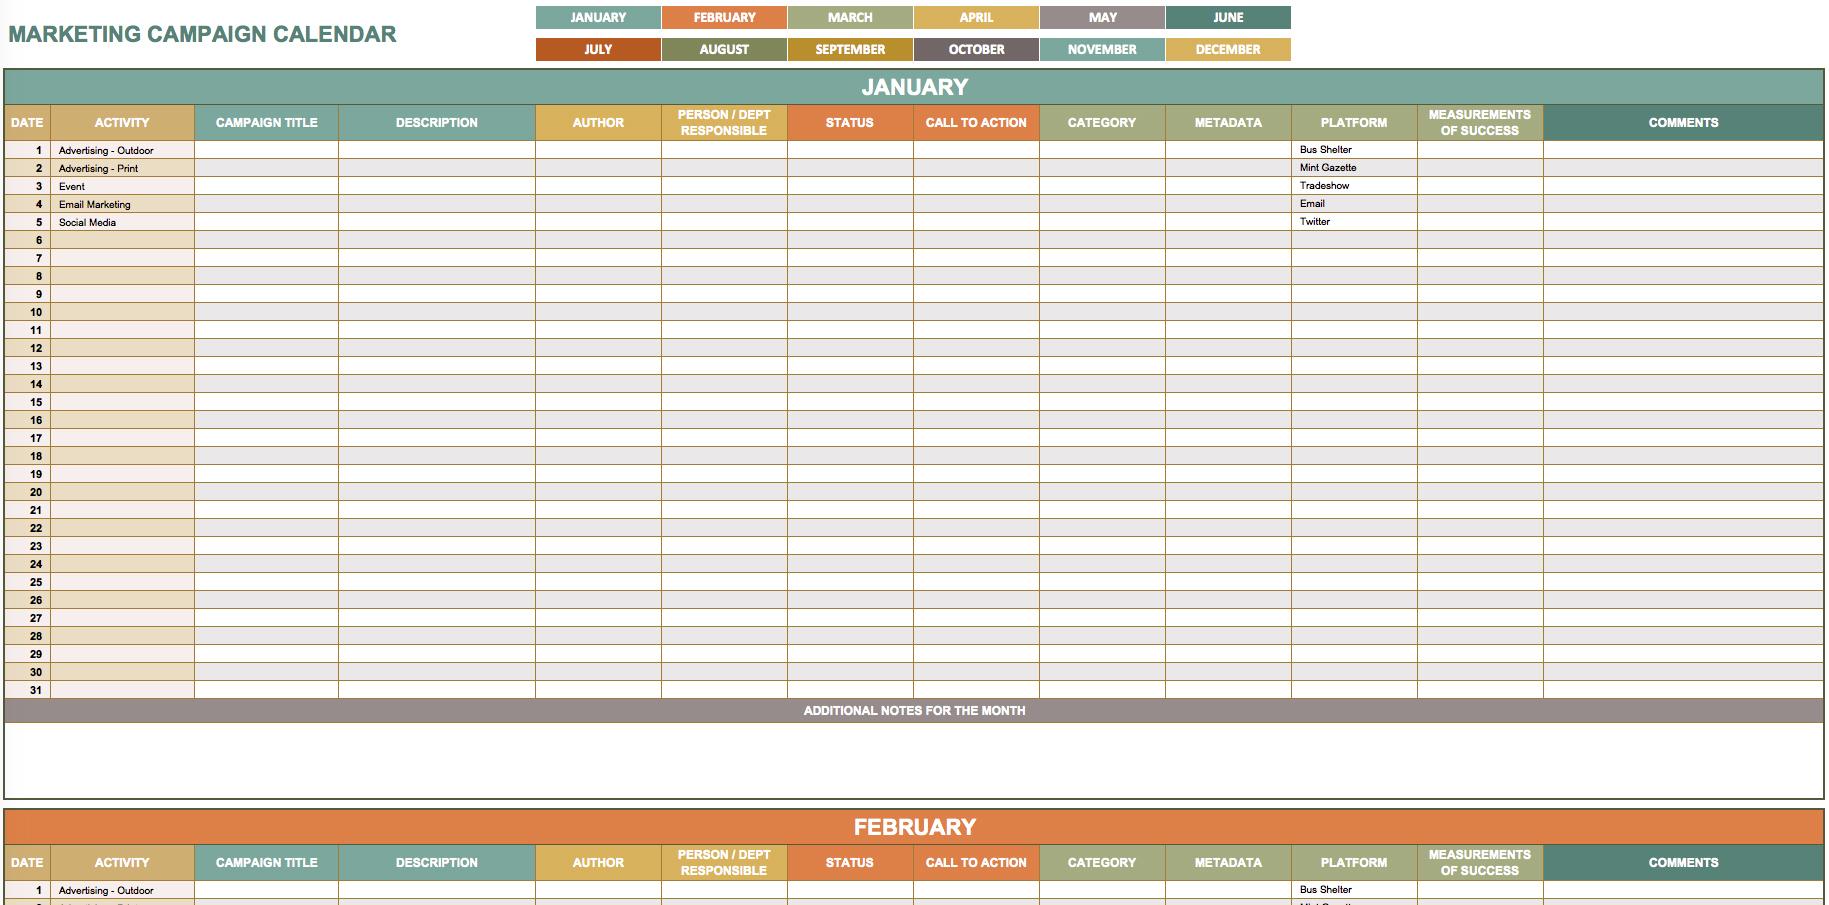 Marketing Budget Spreadsheet Template Regarding Digital Marketing Plan Template Excel Marketing Spreadsheet Template